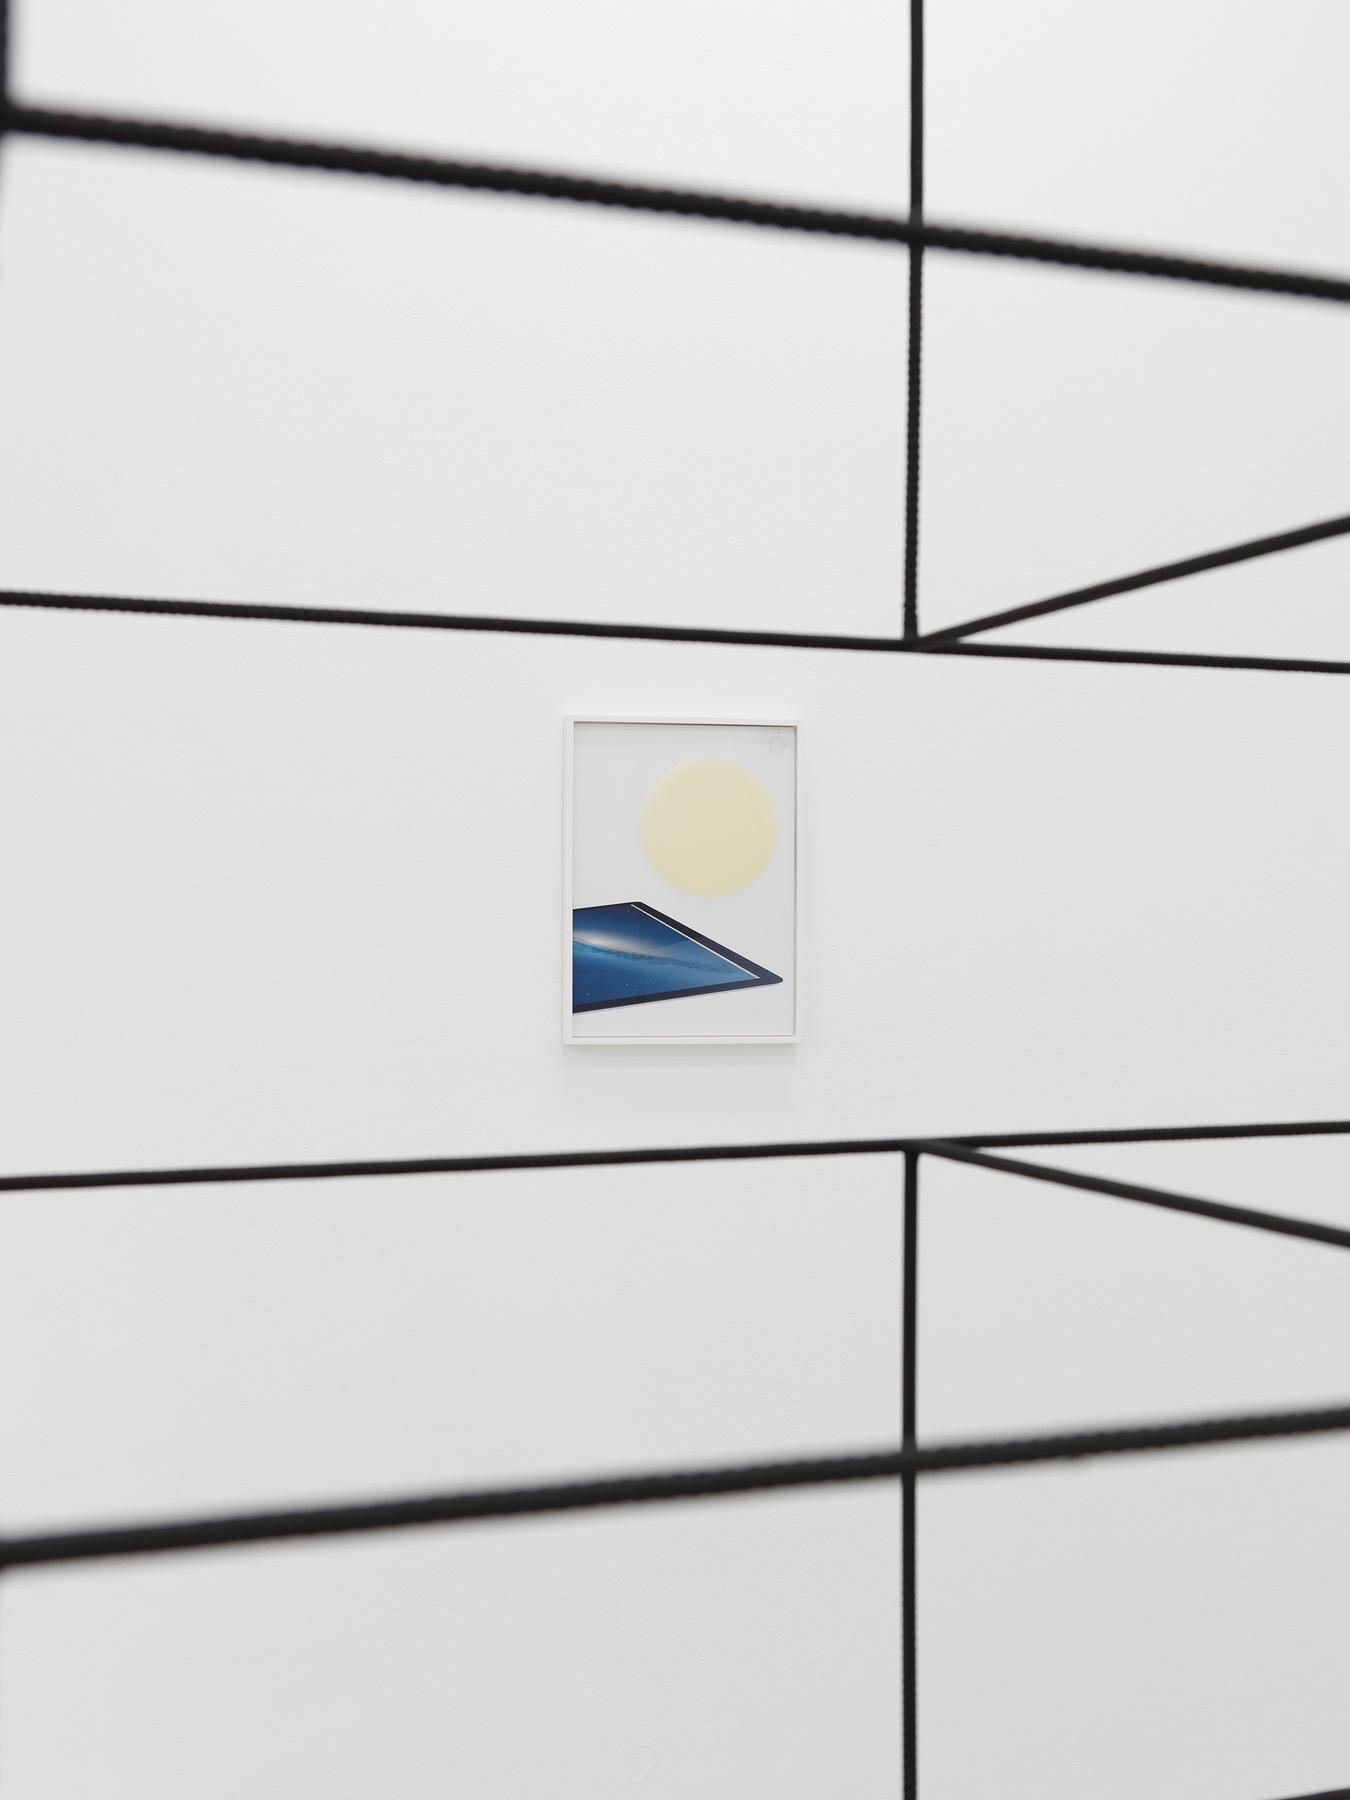 06_Edit Oderbolz_Kunstverein Nürnberg_2017